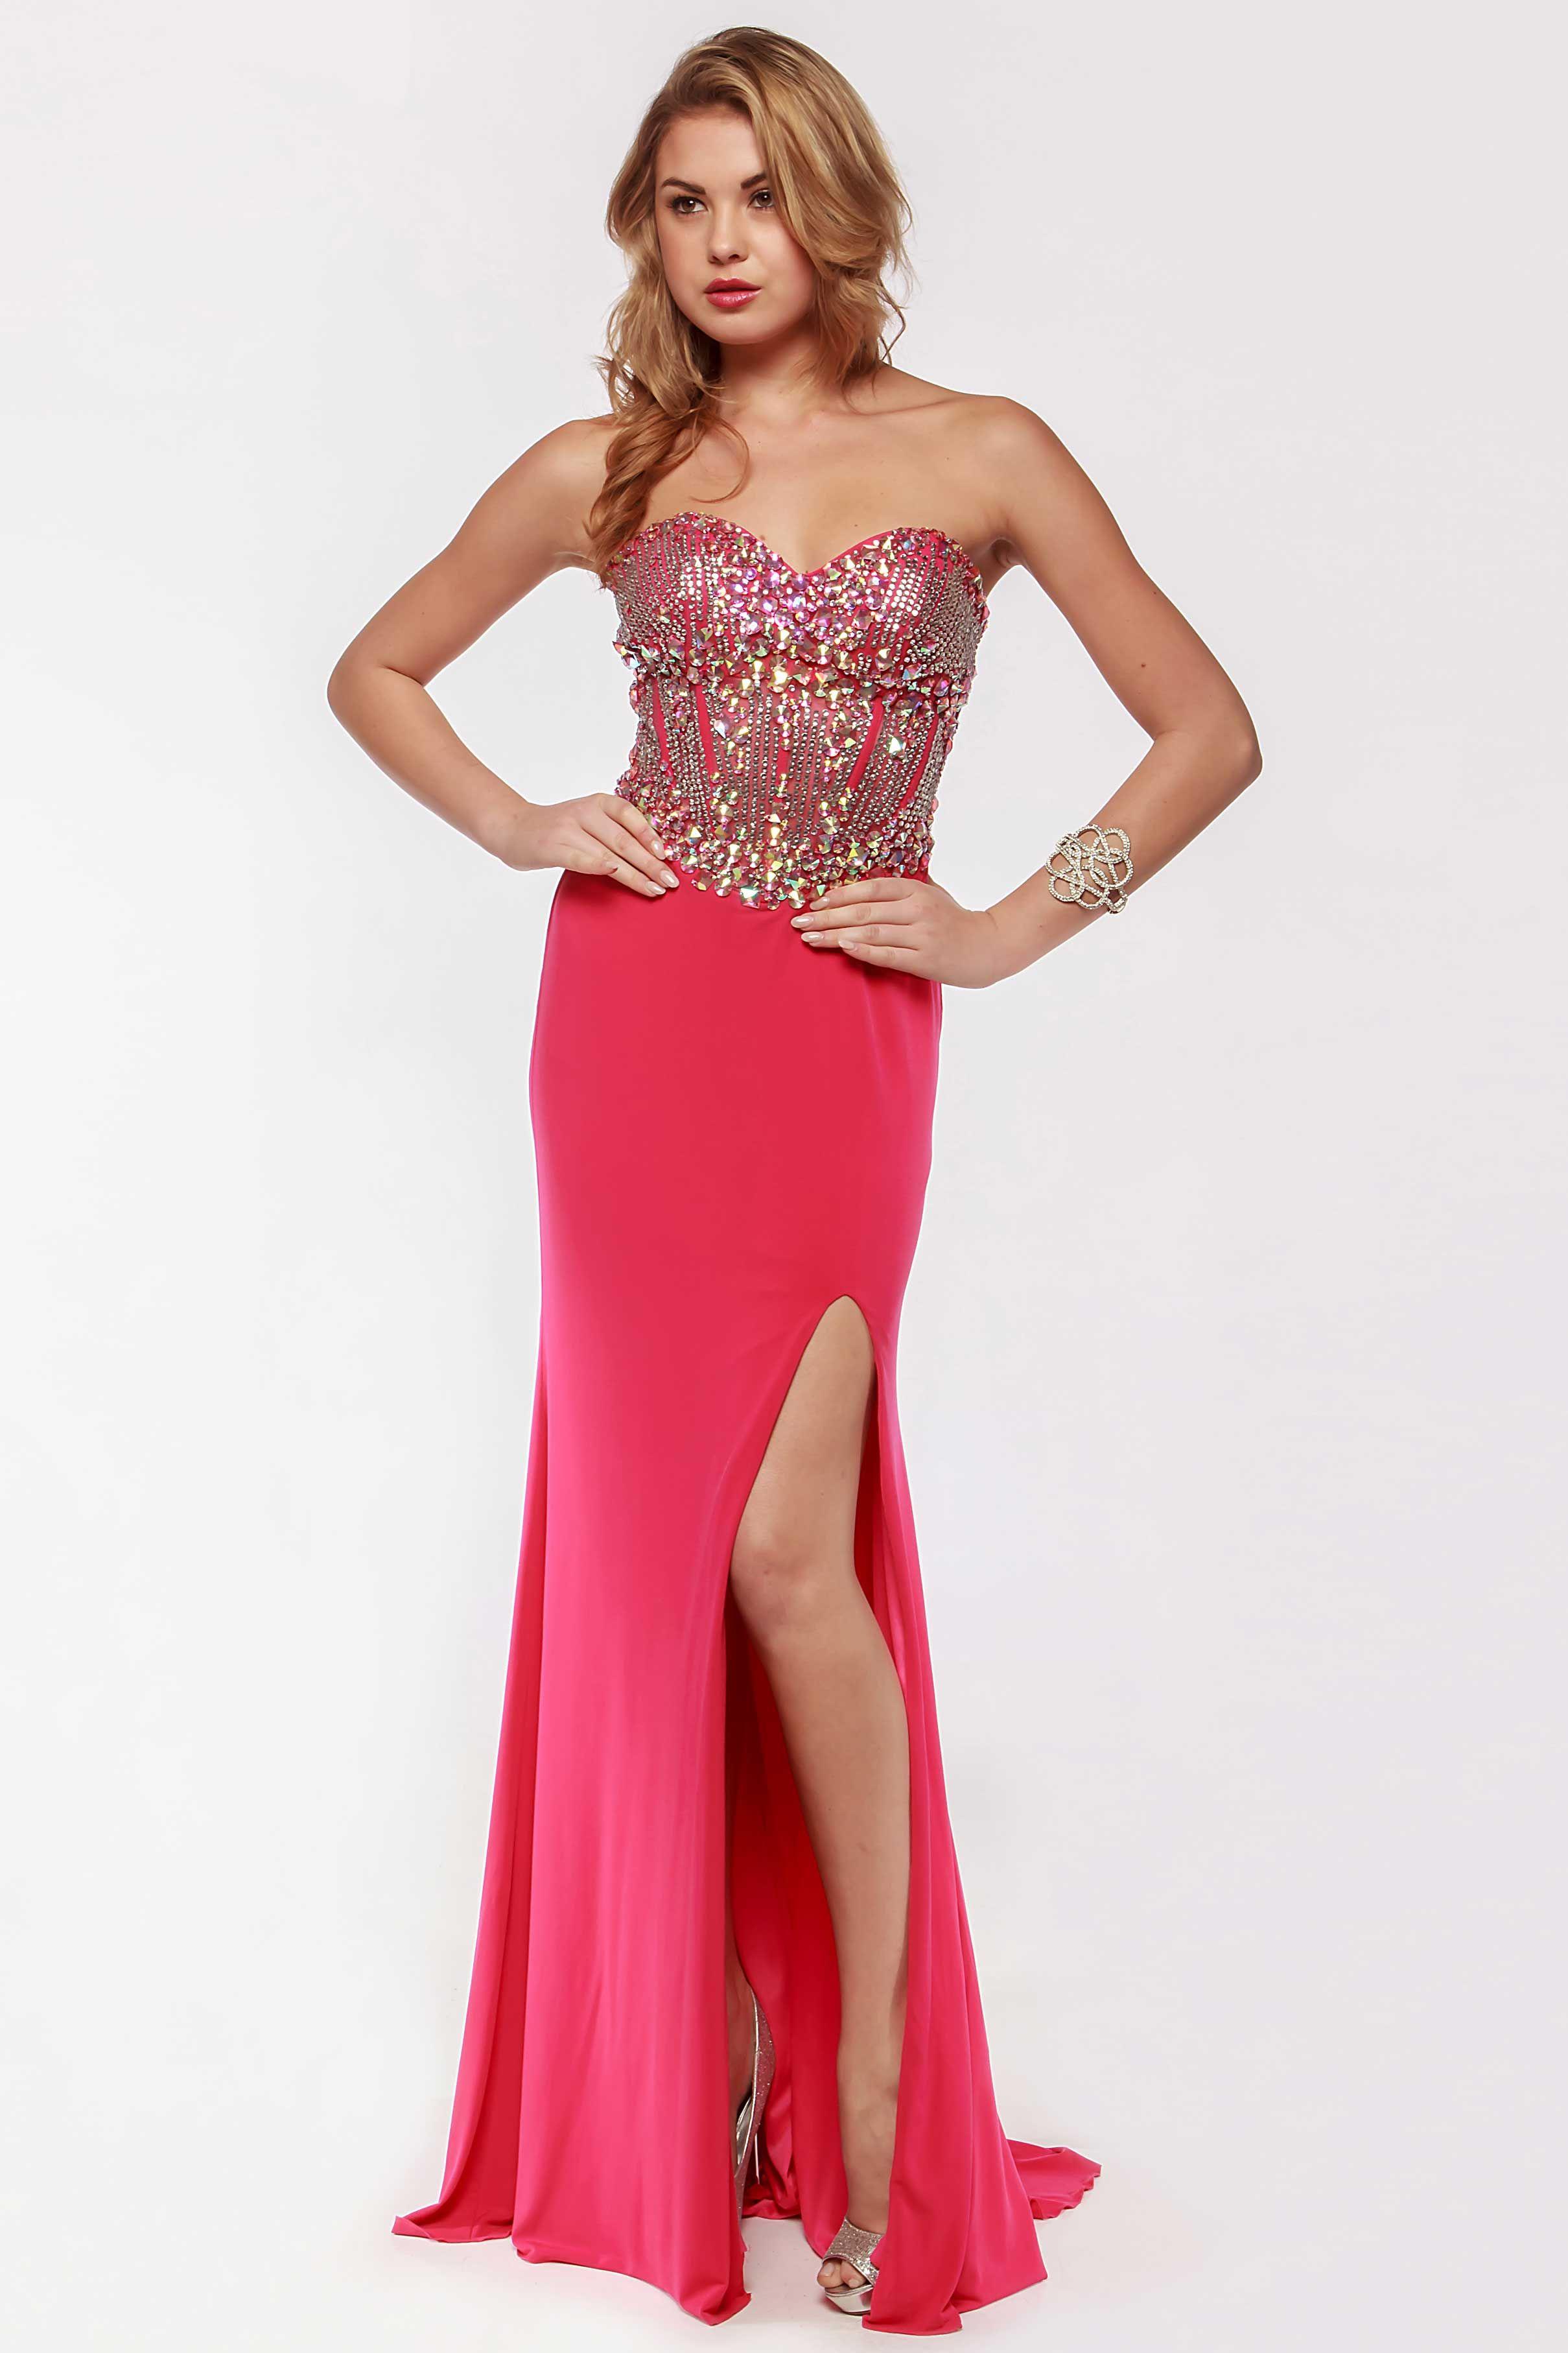 Long prom dress ac floor length sheath shape prom dress with